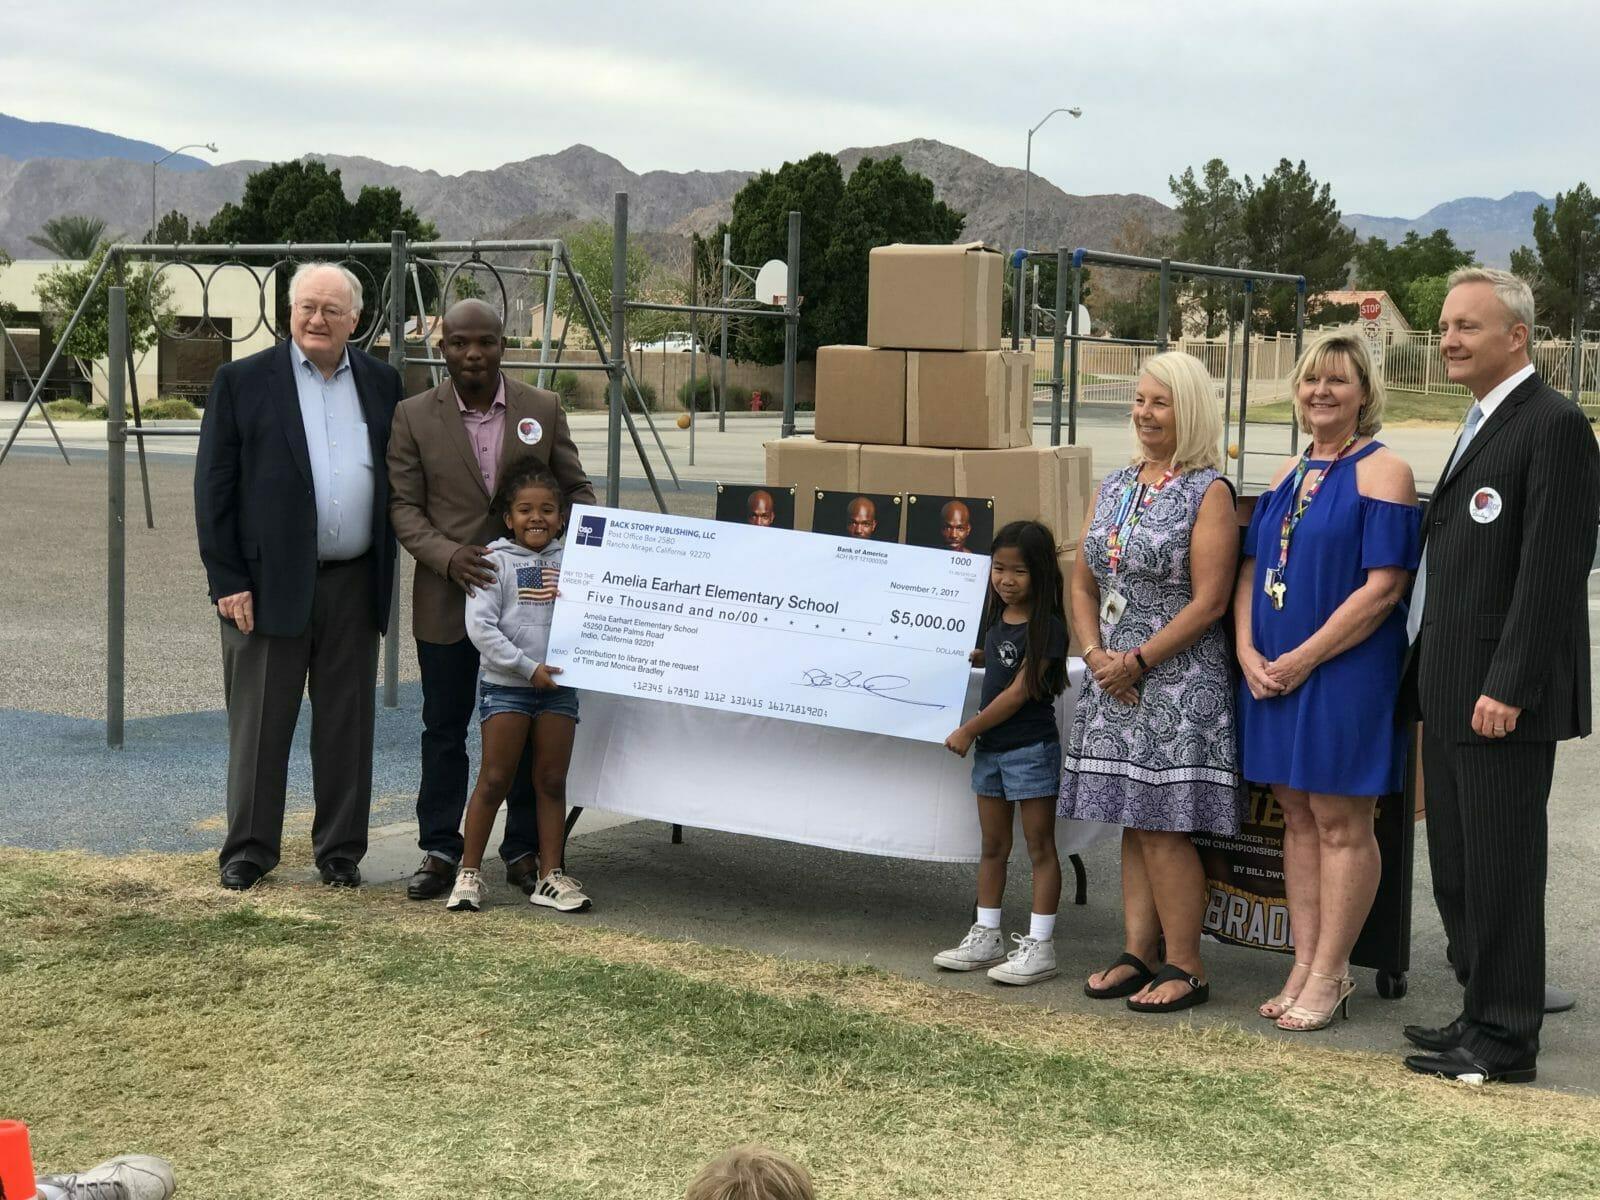 Tim Bradley Donates 5 000 For School Library